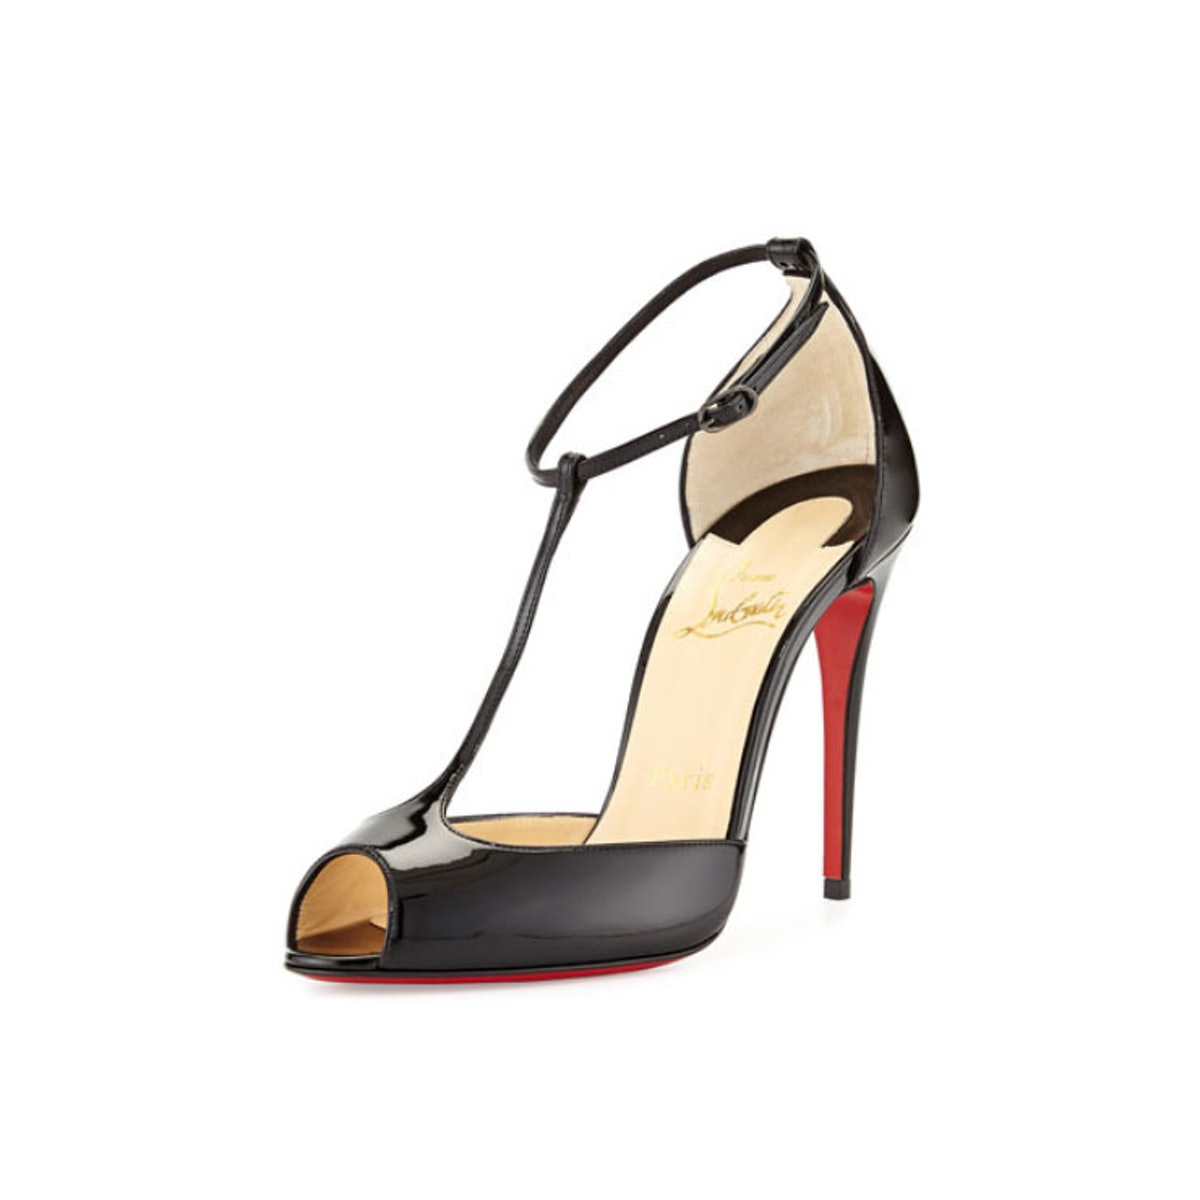 Christian Louboutin Senora Patent T-Strap Red Sole Sandal